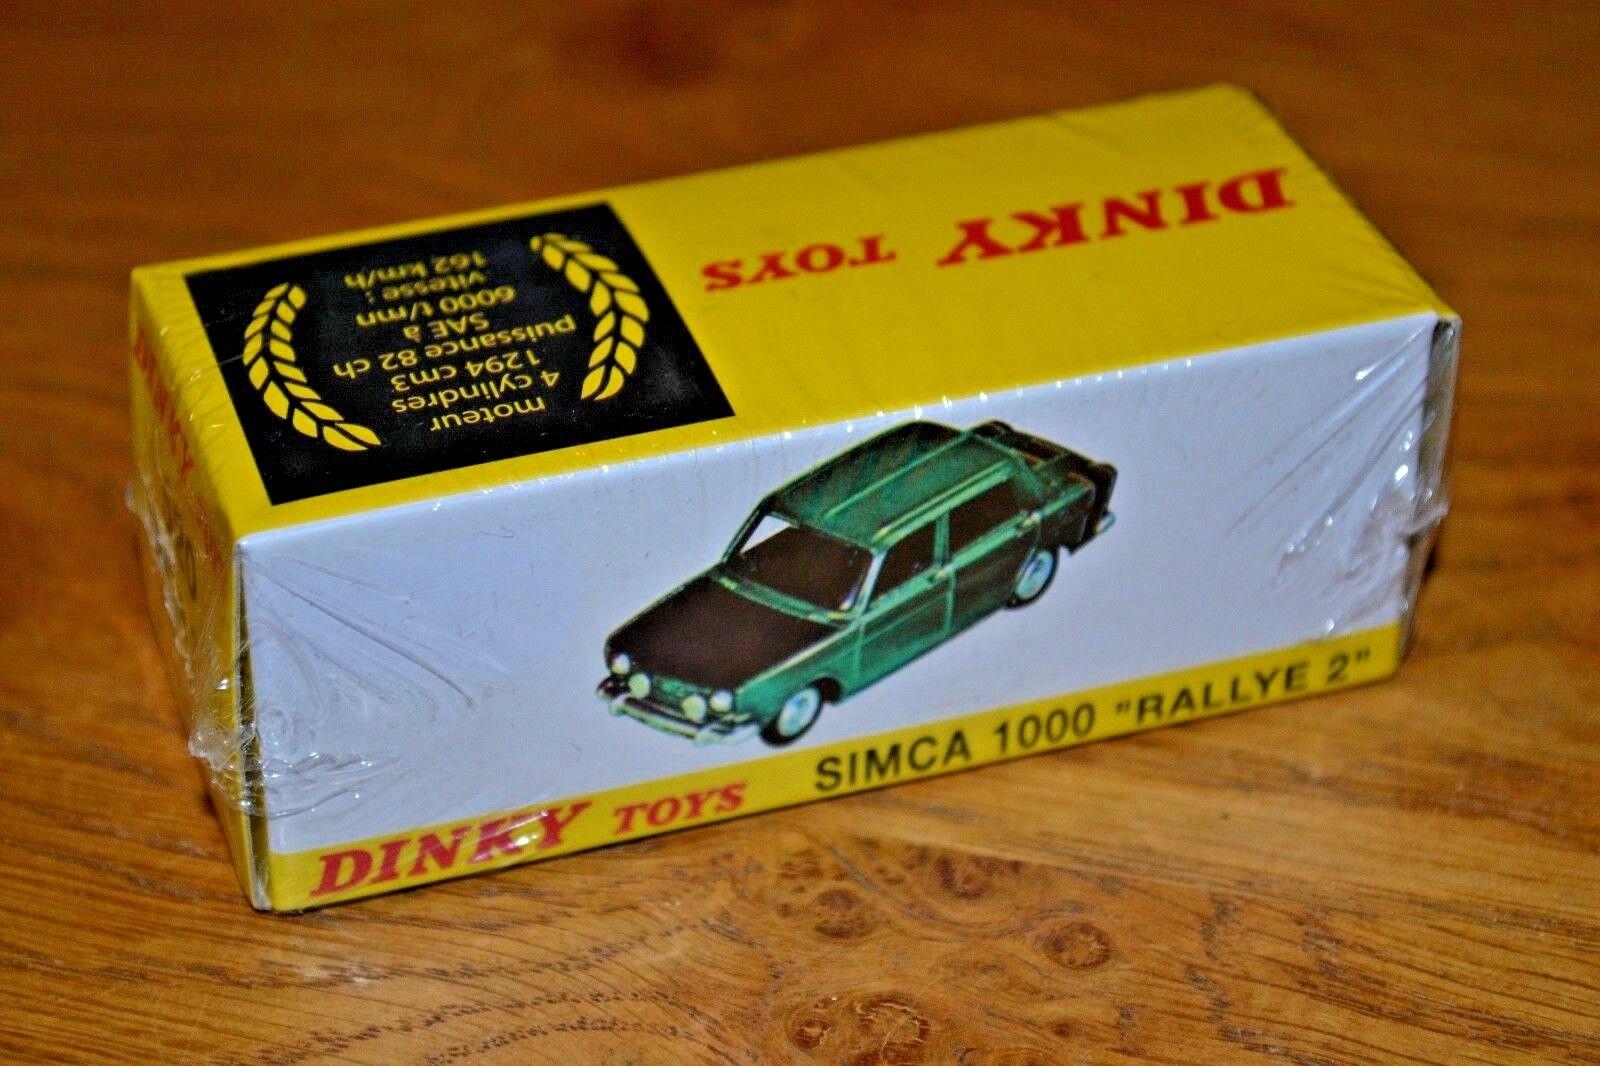 French DINKY TOYS ATLAS EDIZIONE Diecast N. 520 SIMCA 1000 RALLY 2 non aperto